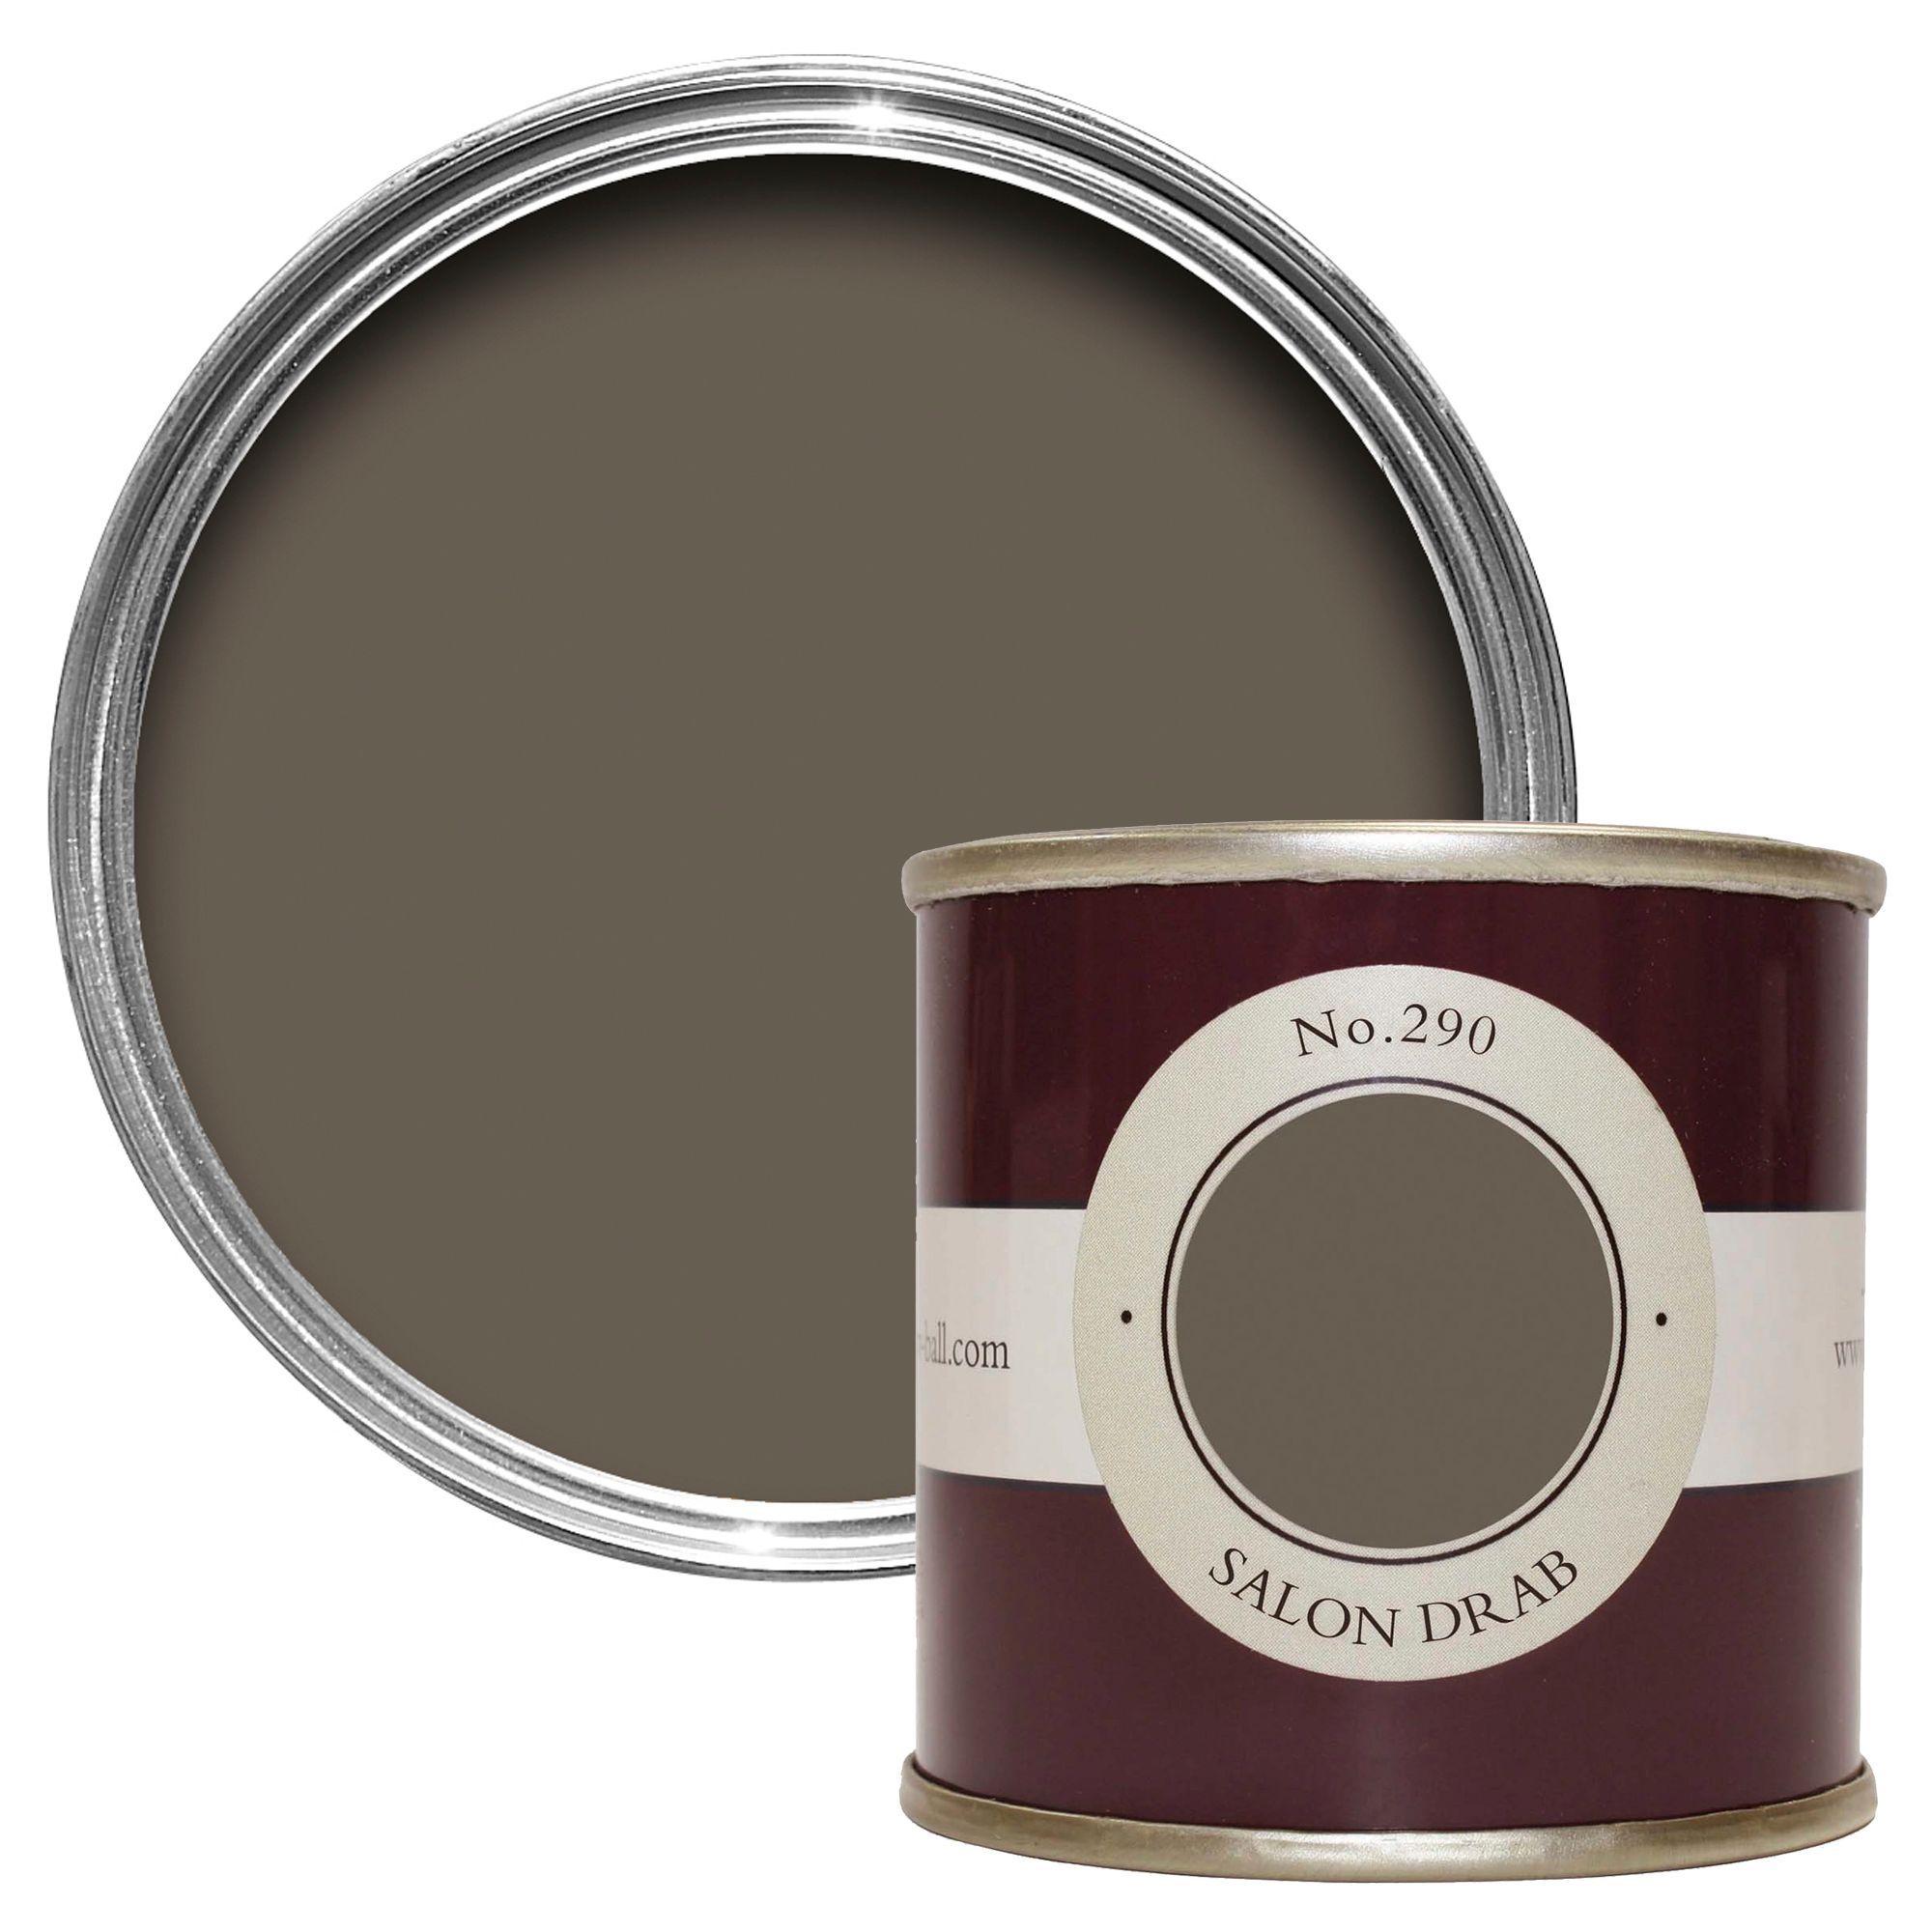 Farrow & Ball Salon Drab no.290 Estate emulsion